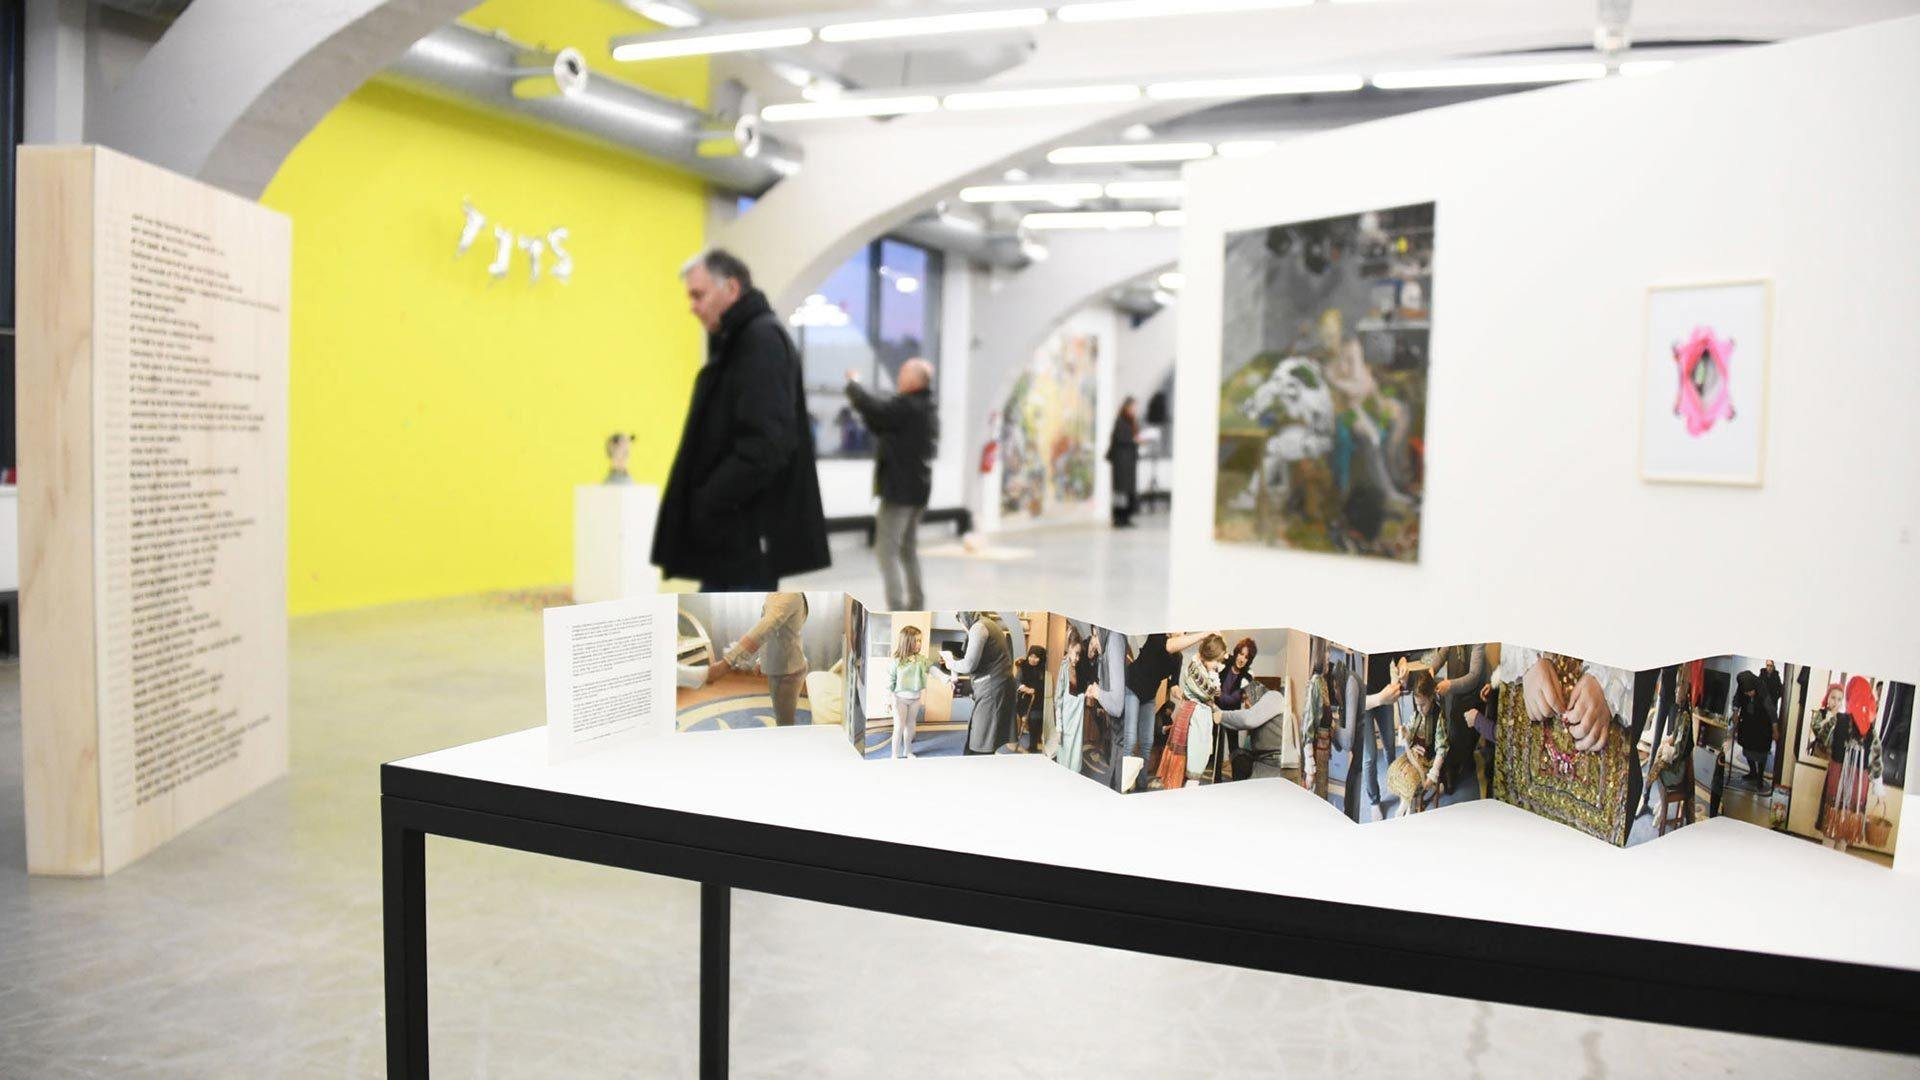 La Kunsthalle : ouverture le 11 juin © Photo : Catherine-Kohler